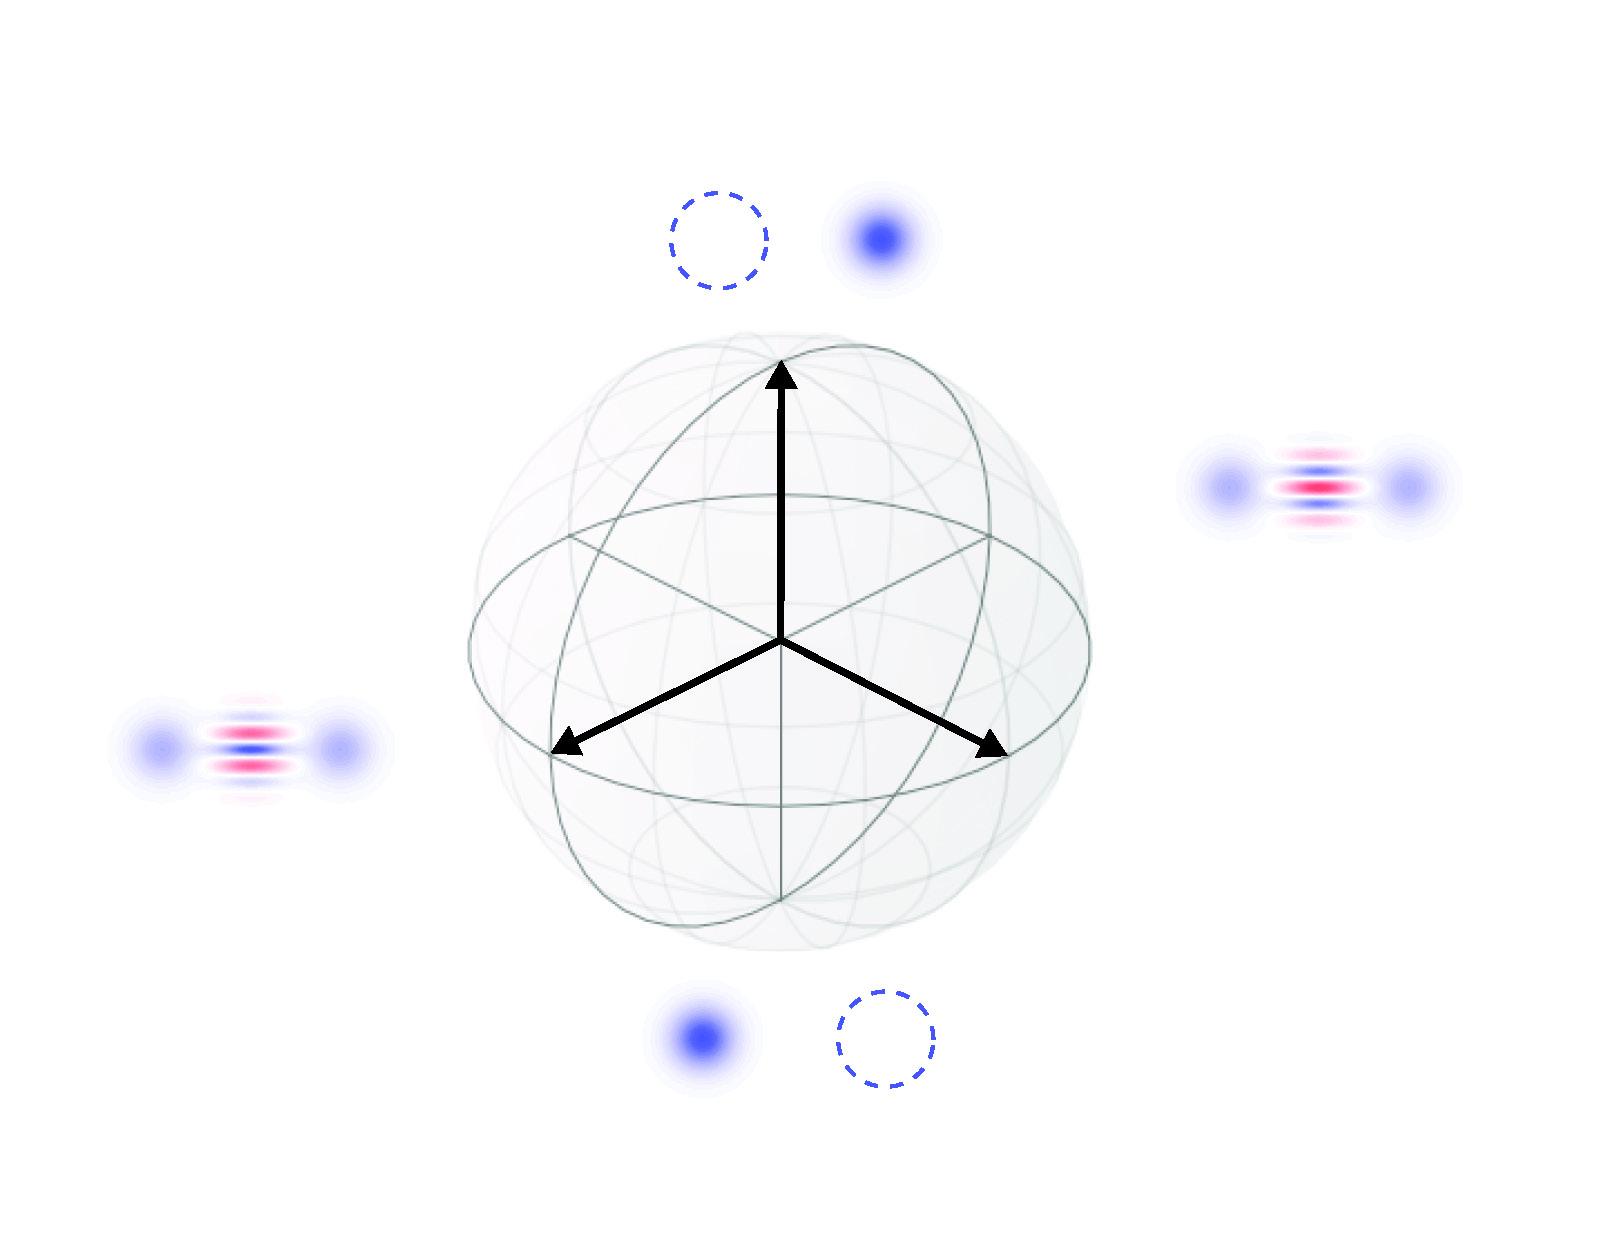 Cat codes on Bloch sphere